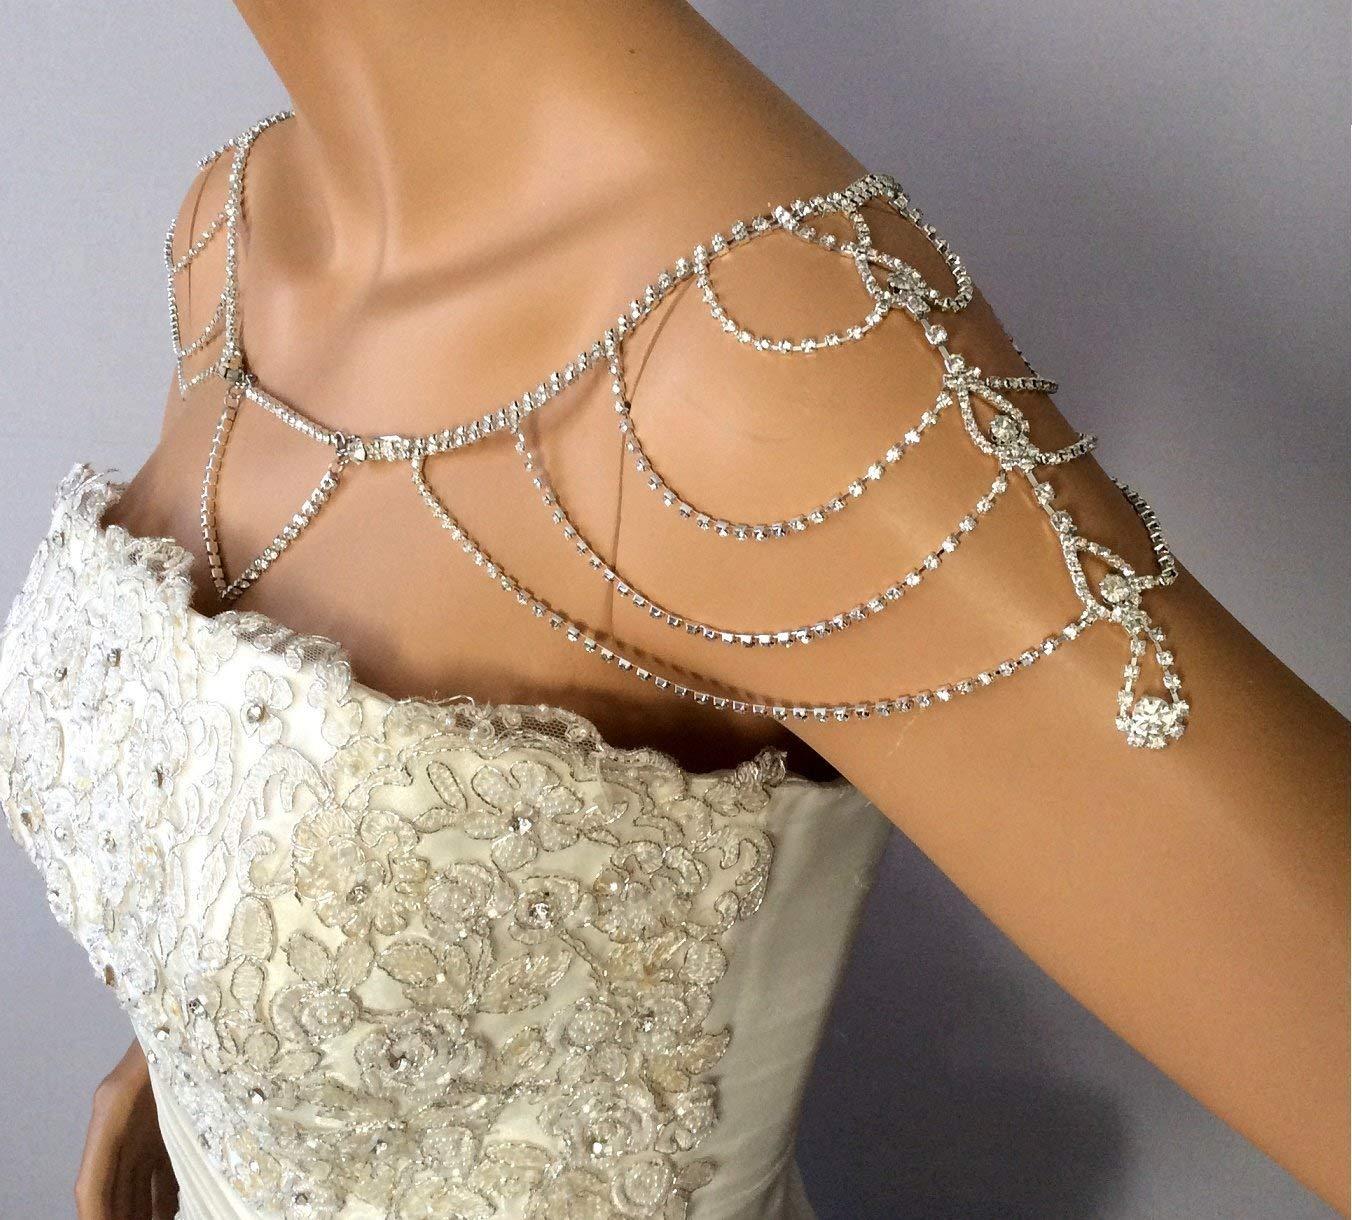 Shoulder Necklace Wedding Shoulder Jewelry Wedding Dress for Shoulder, Bridal Shoulder Necklace Body Accessory For Wedding